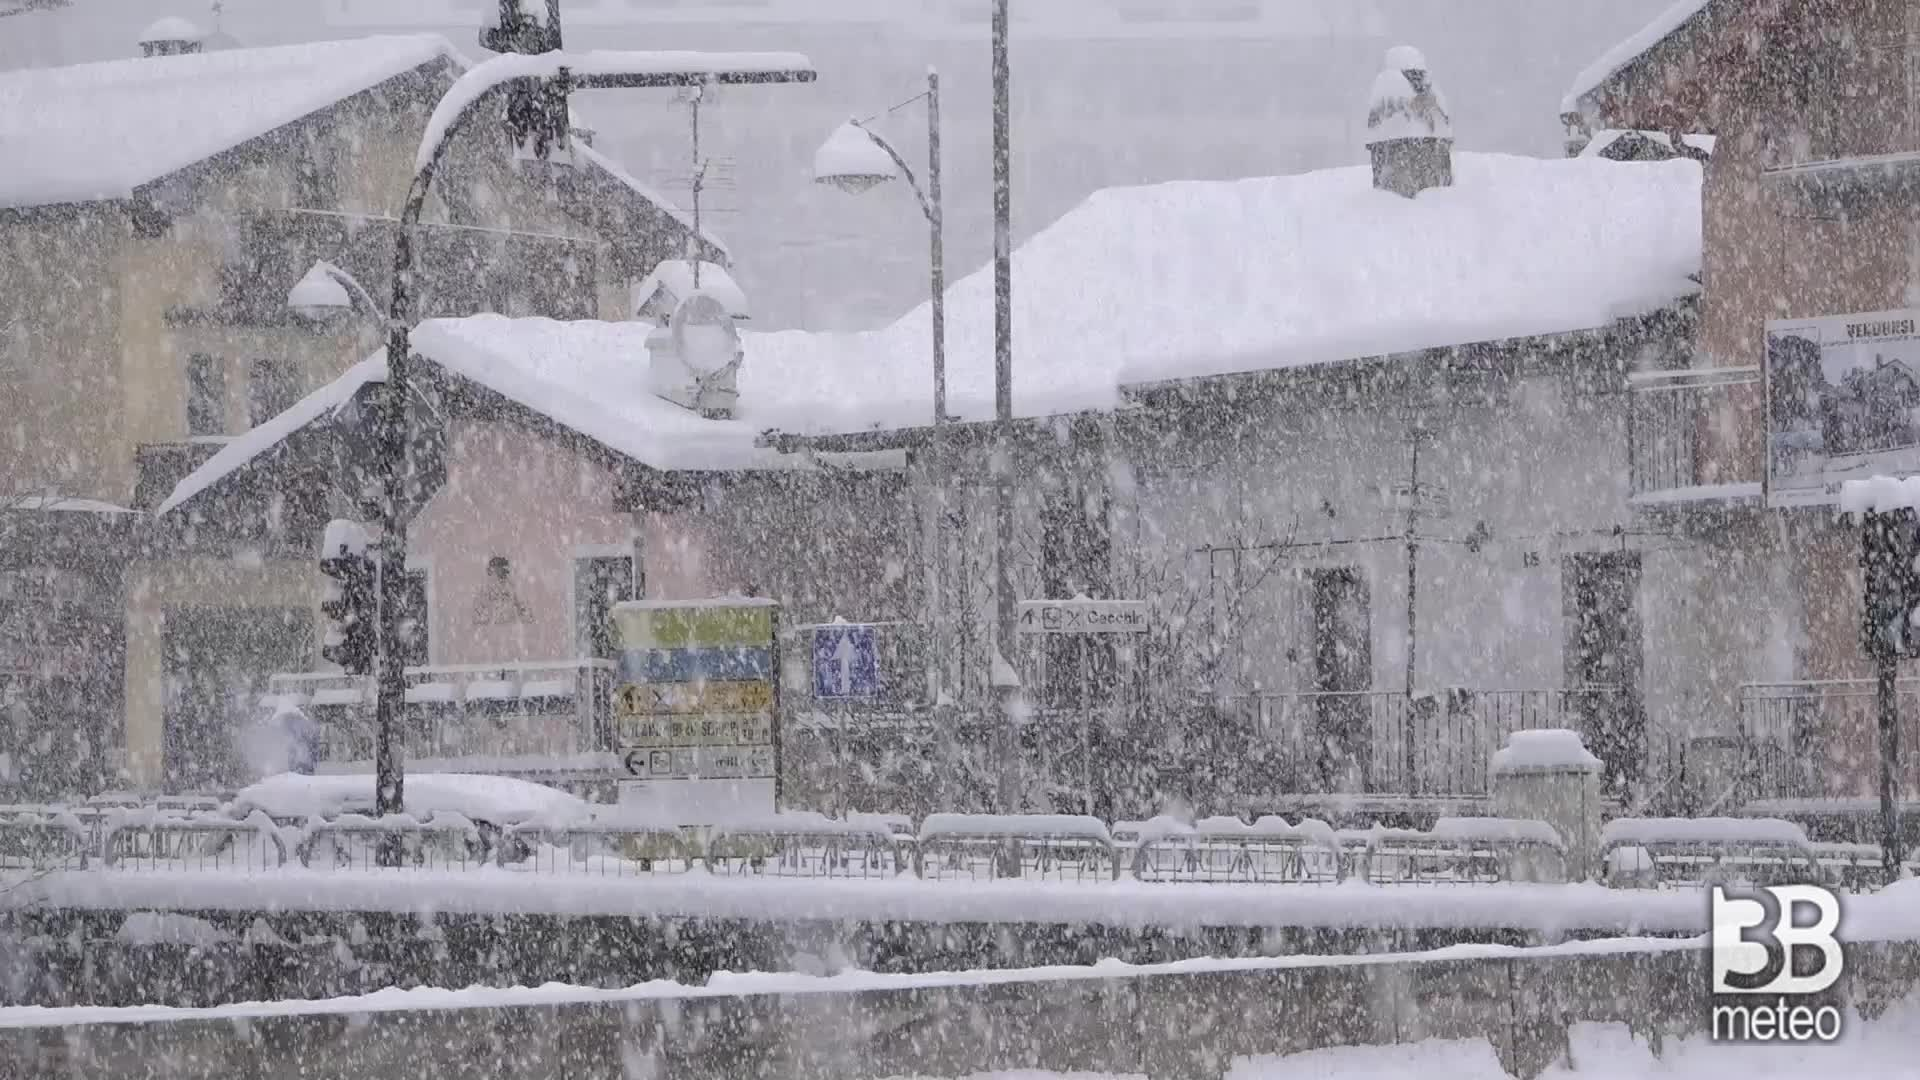 Neve Aosta